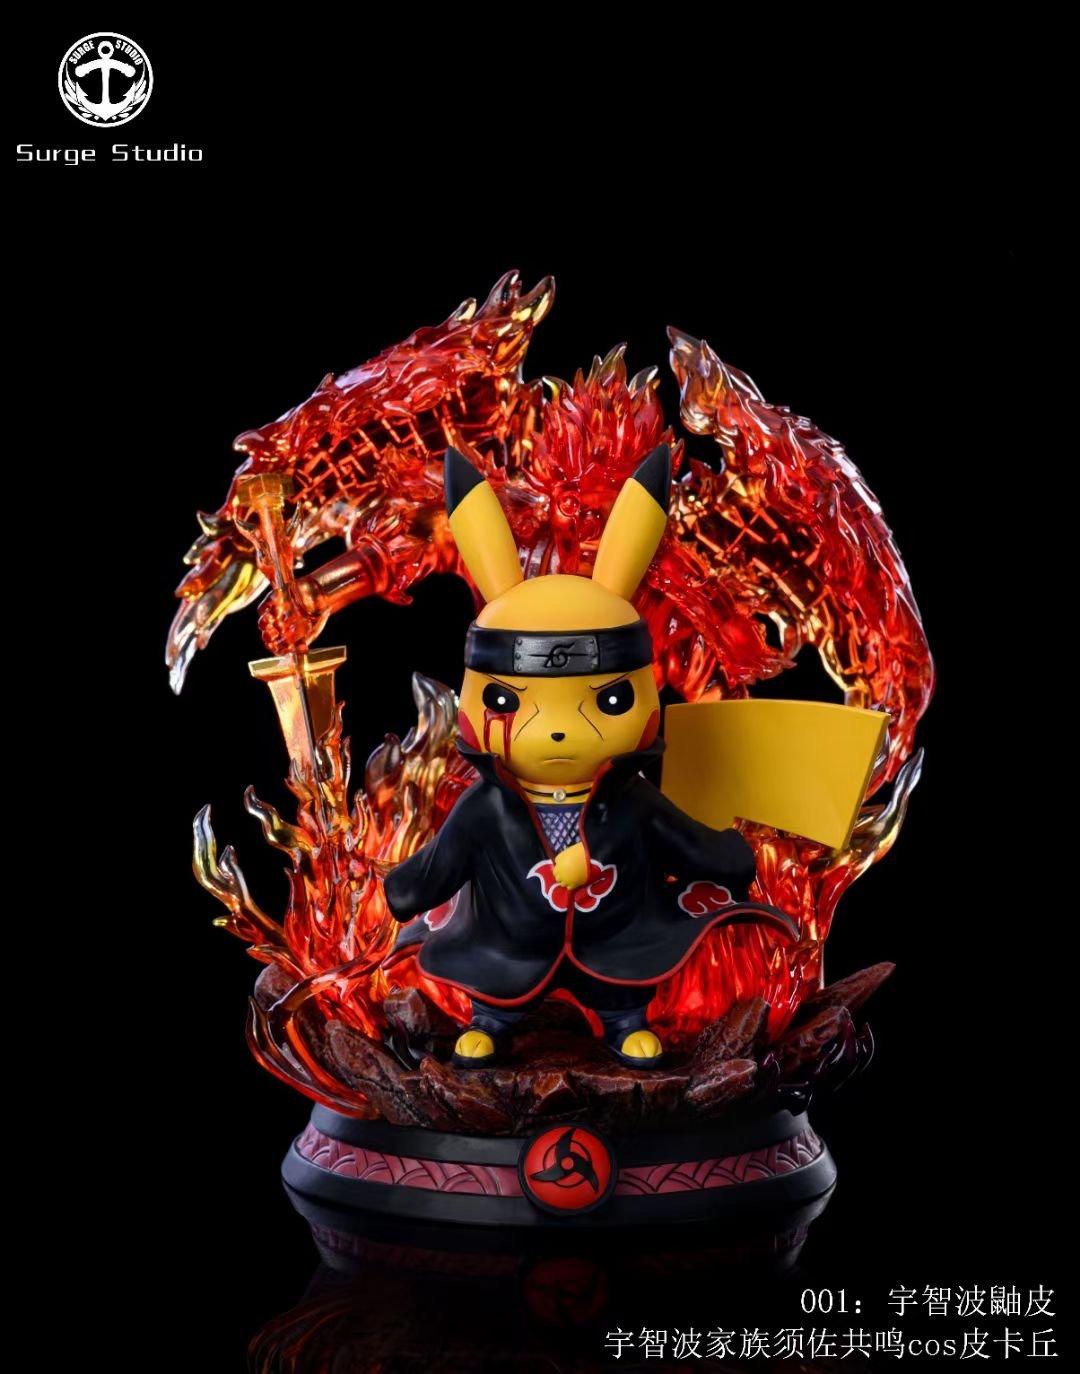 Image of [Pre-Order]Surge Studio Pikachu Cross Itachi Resin Statue